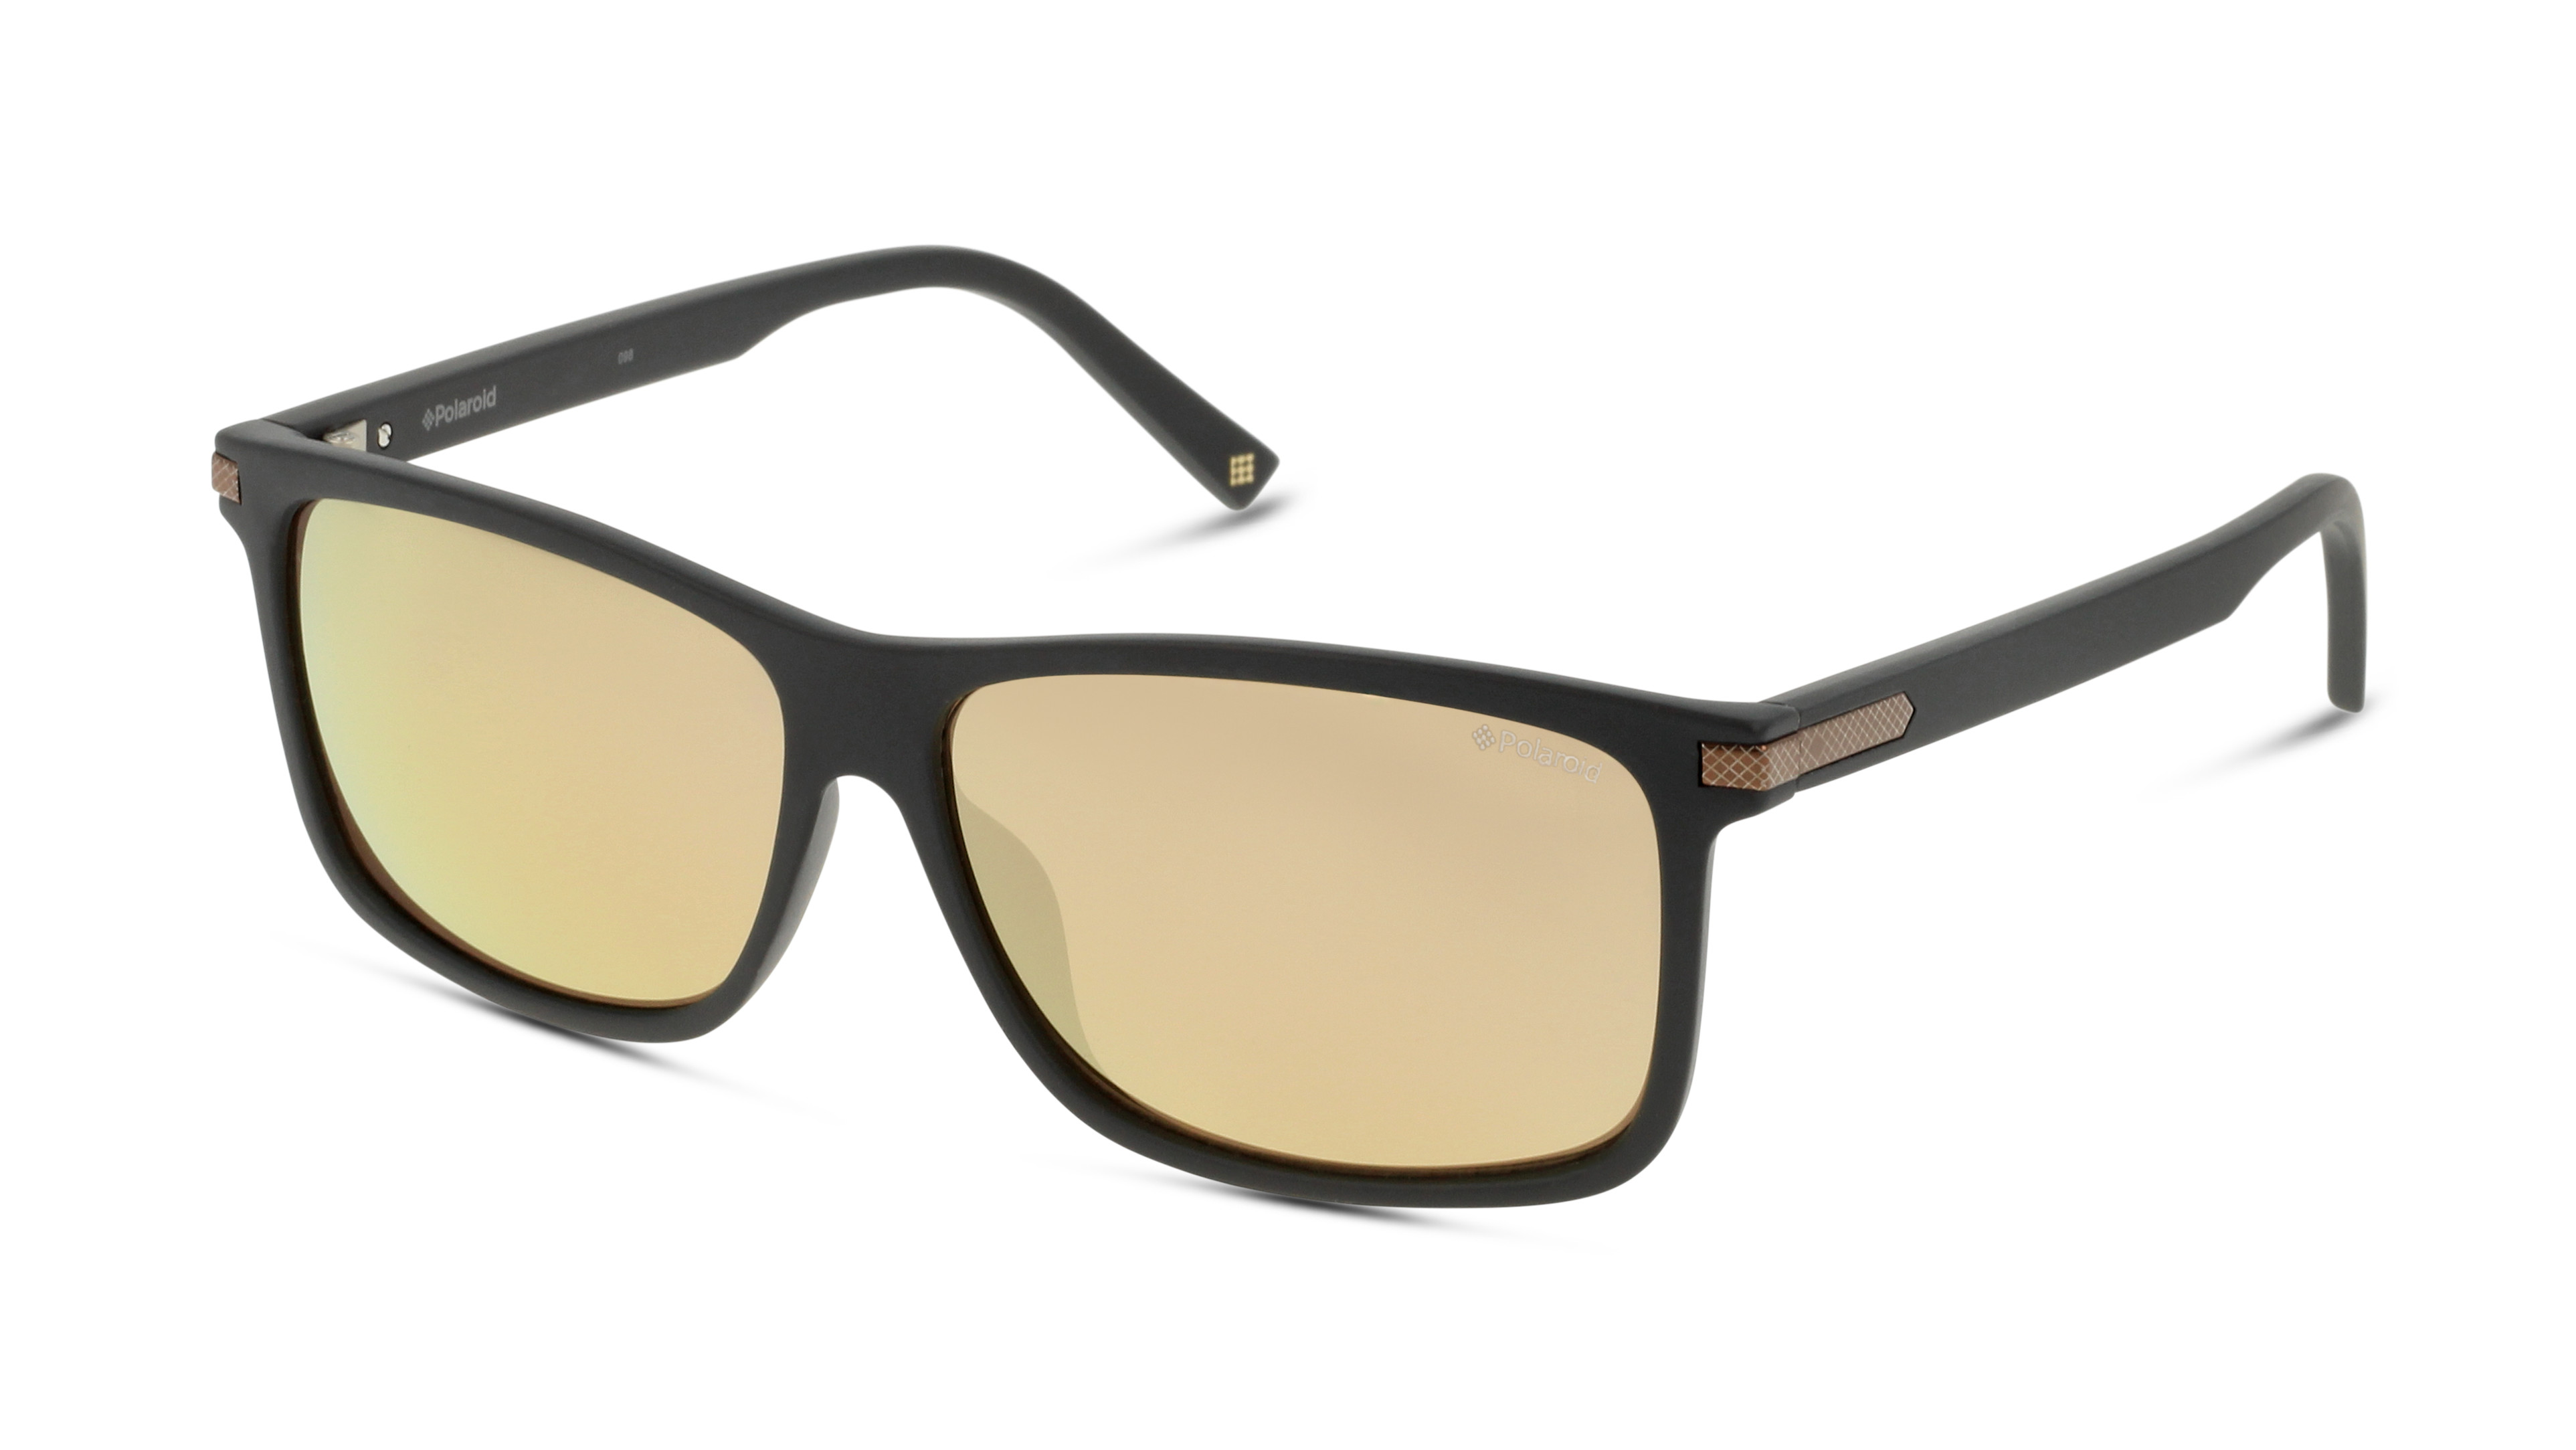 716736139906-angle-03-polaroid-pld_2075_s_x-eyewear-mtt-black_1